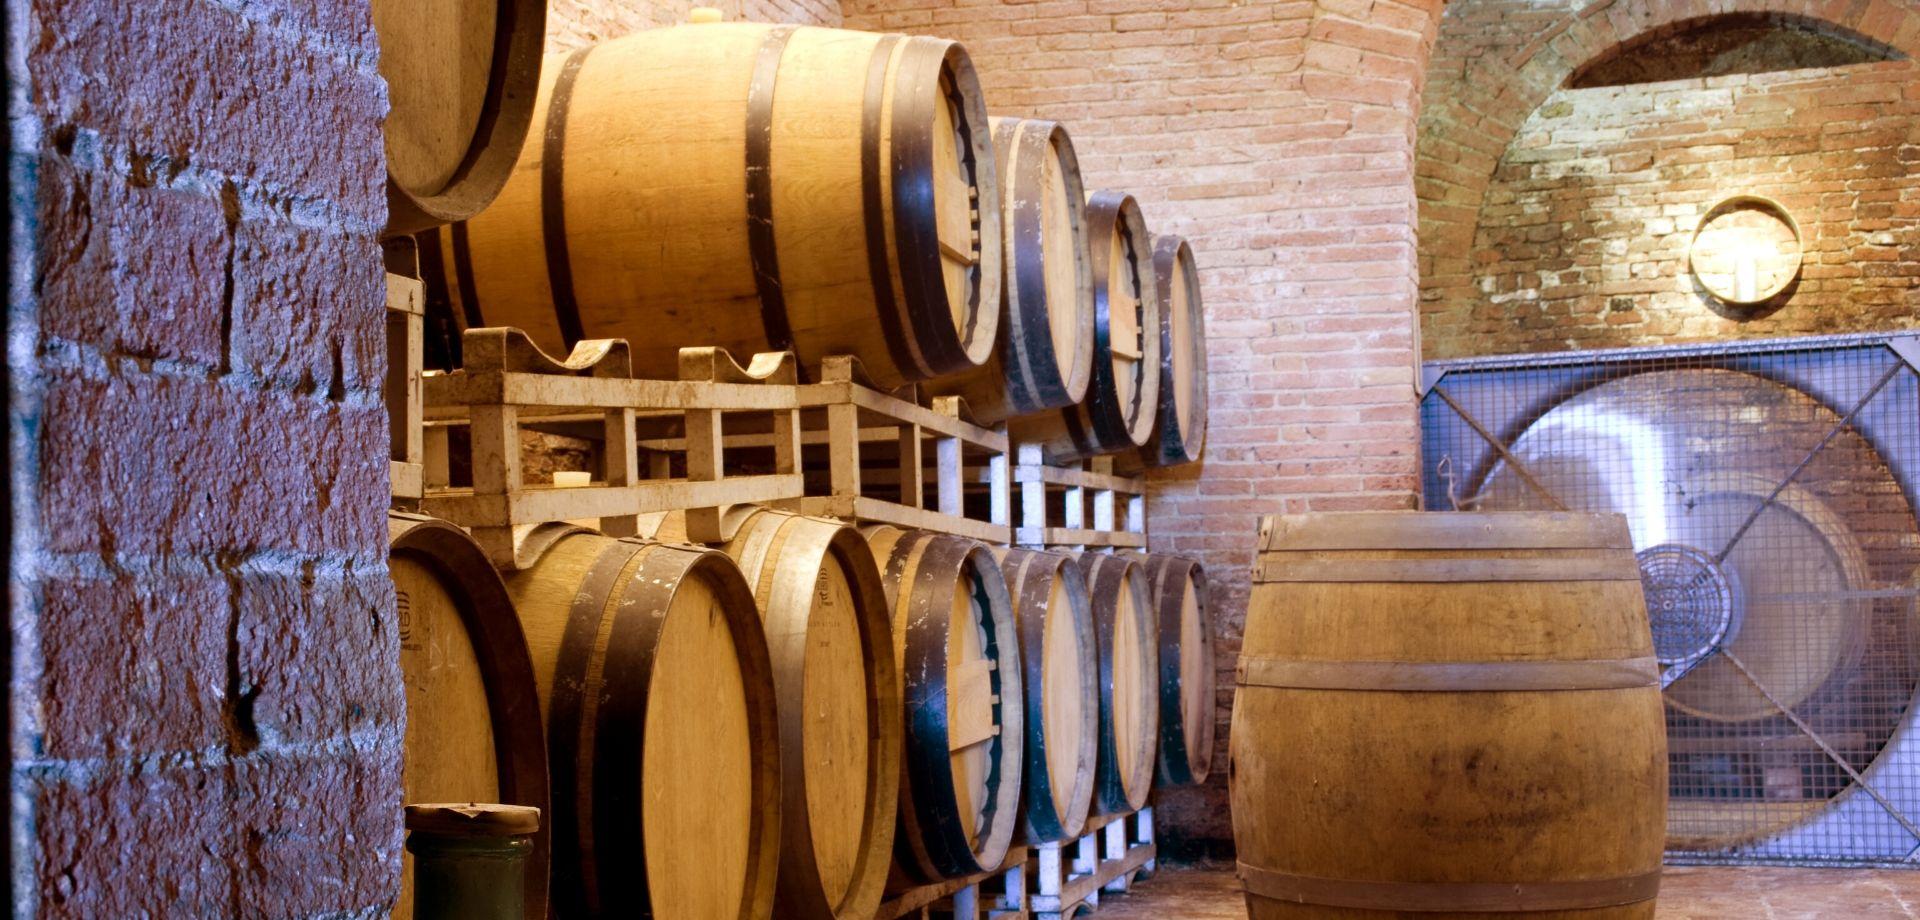 Lezione sui vini naturali in Toscana